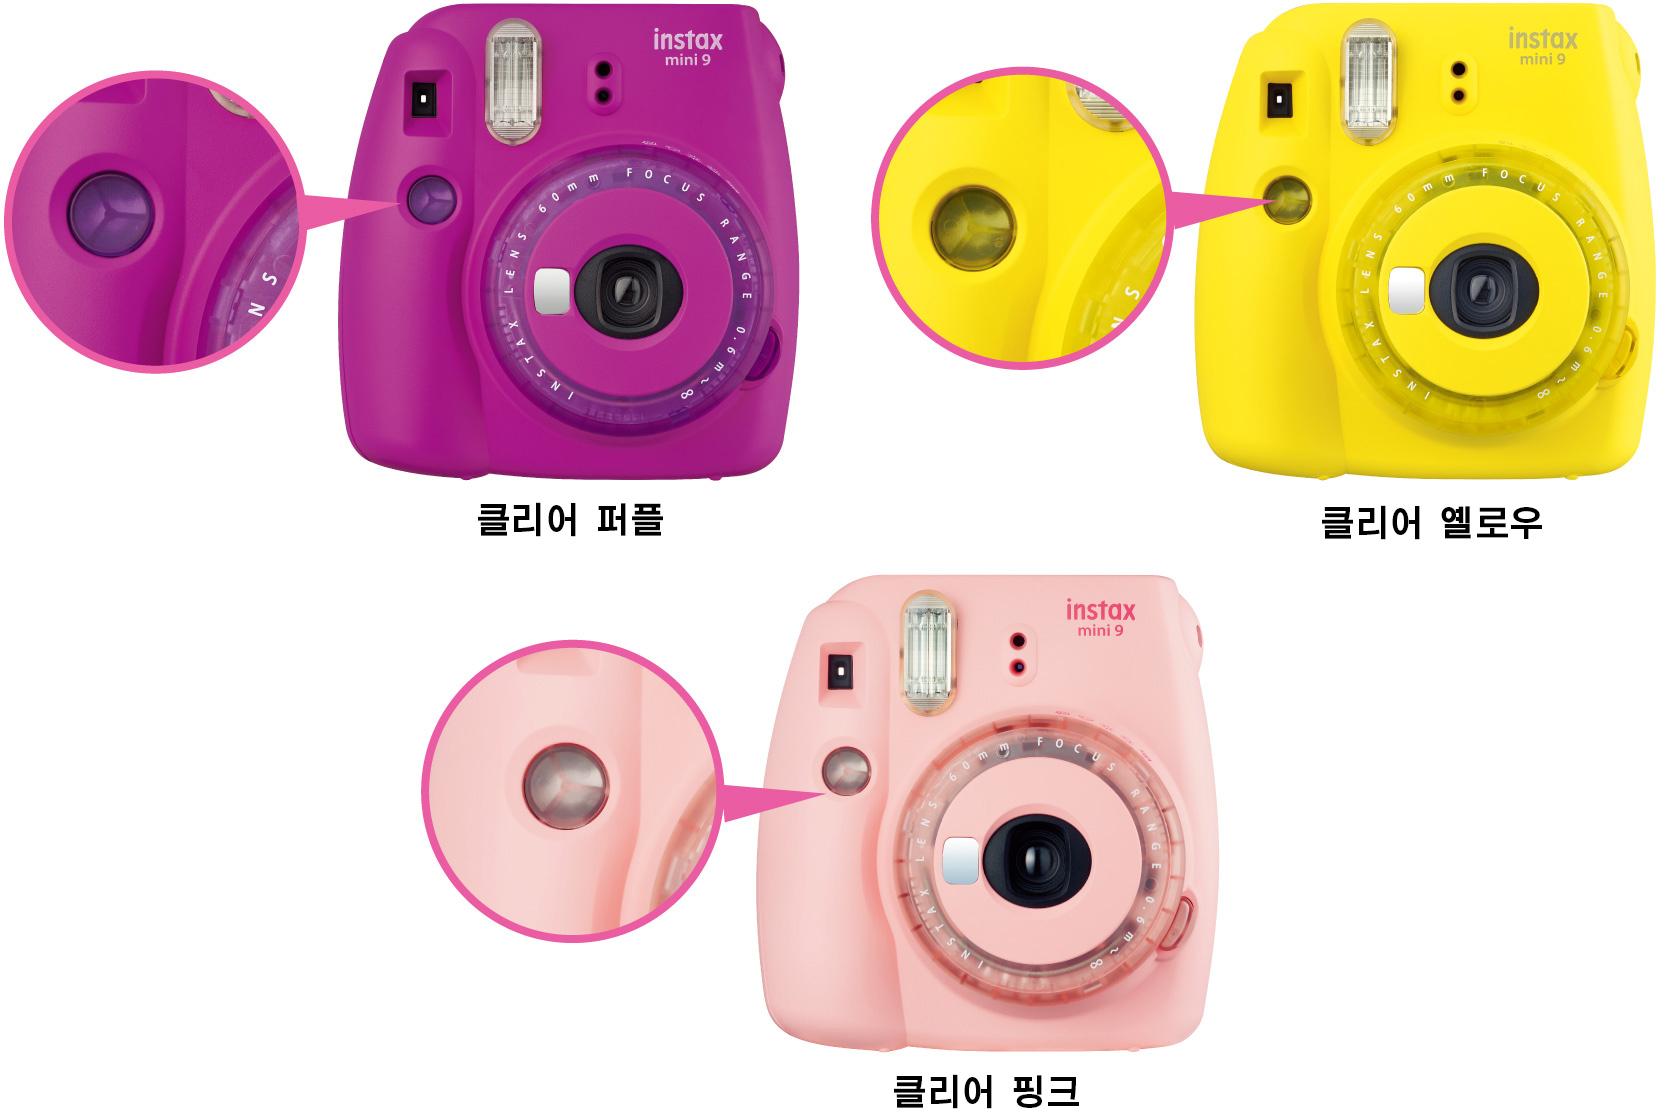 [photo] 퍼플, 옐로우, 핑크 색상의 인스탁스 미니9 리미티드 에디션 필름카메라. 포인트 컬러 클로즈업